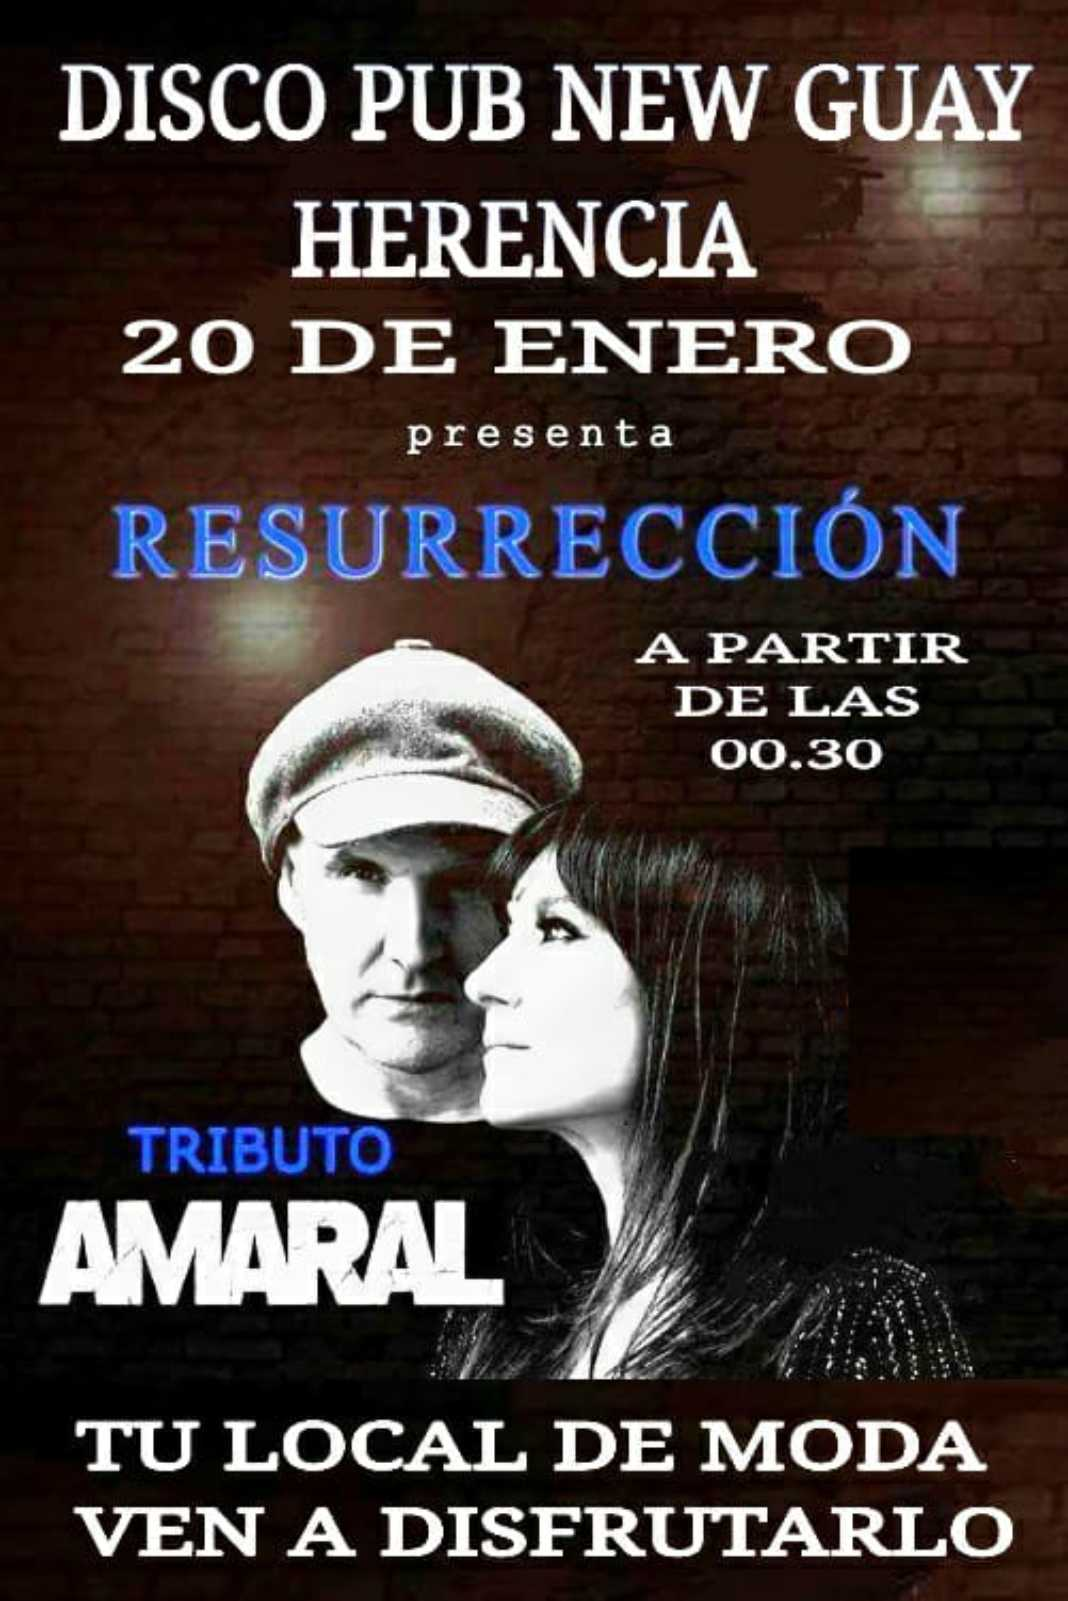 Concierto tributo Amaral en New Guay 1068x1601 - Tributo a Amaral en disco-pub New Guay